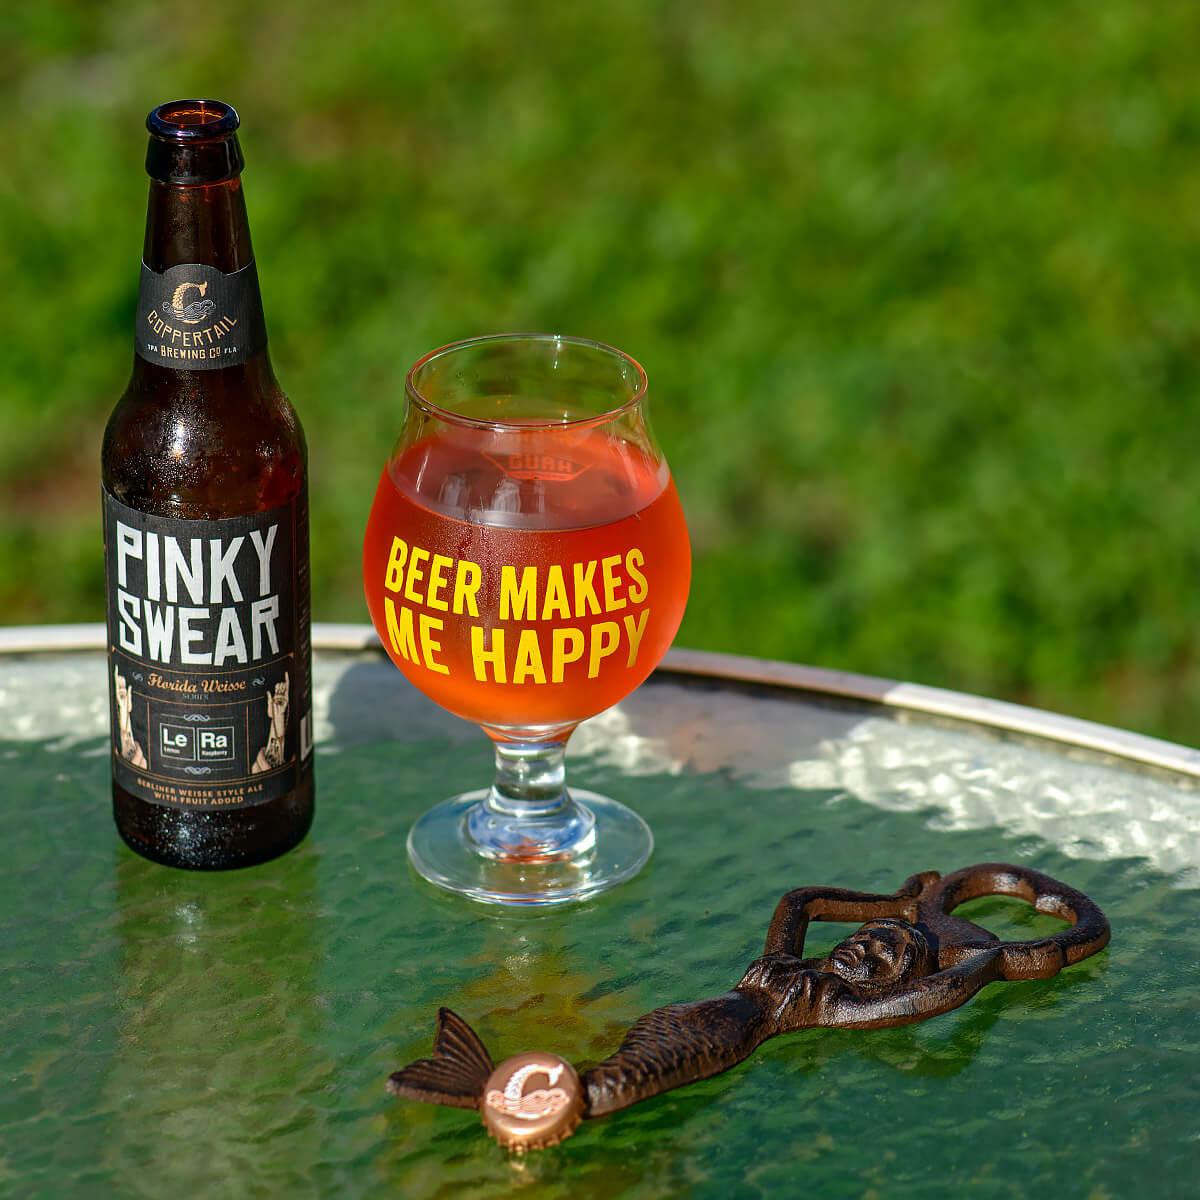 Pinky Swear, a Berliner Weisse by Coppertail Brewing Co.